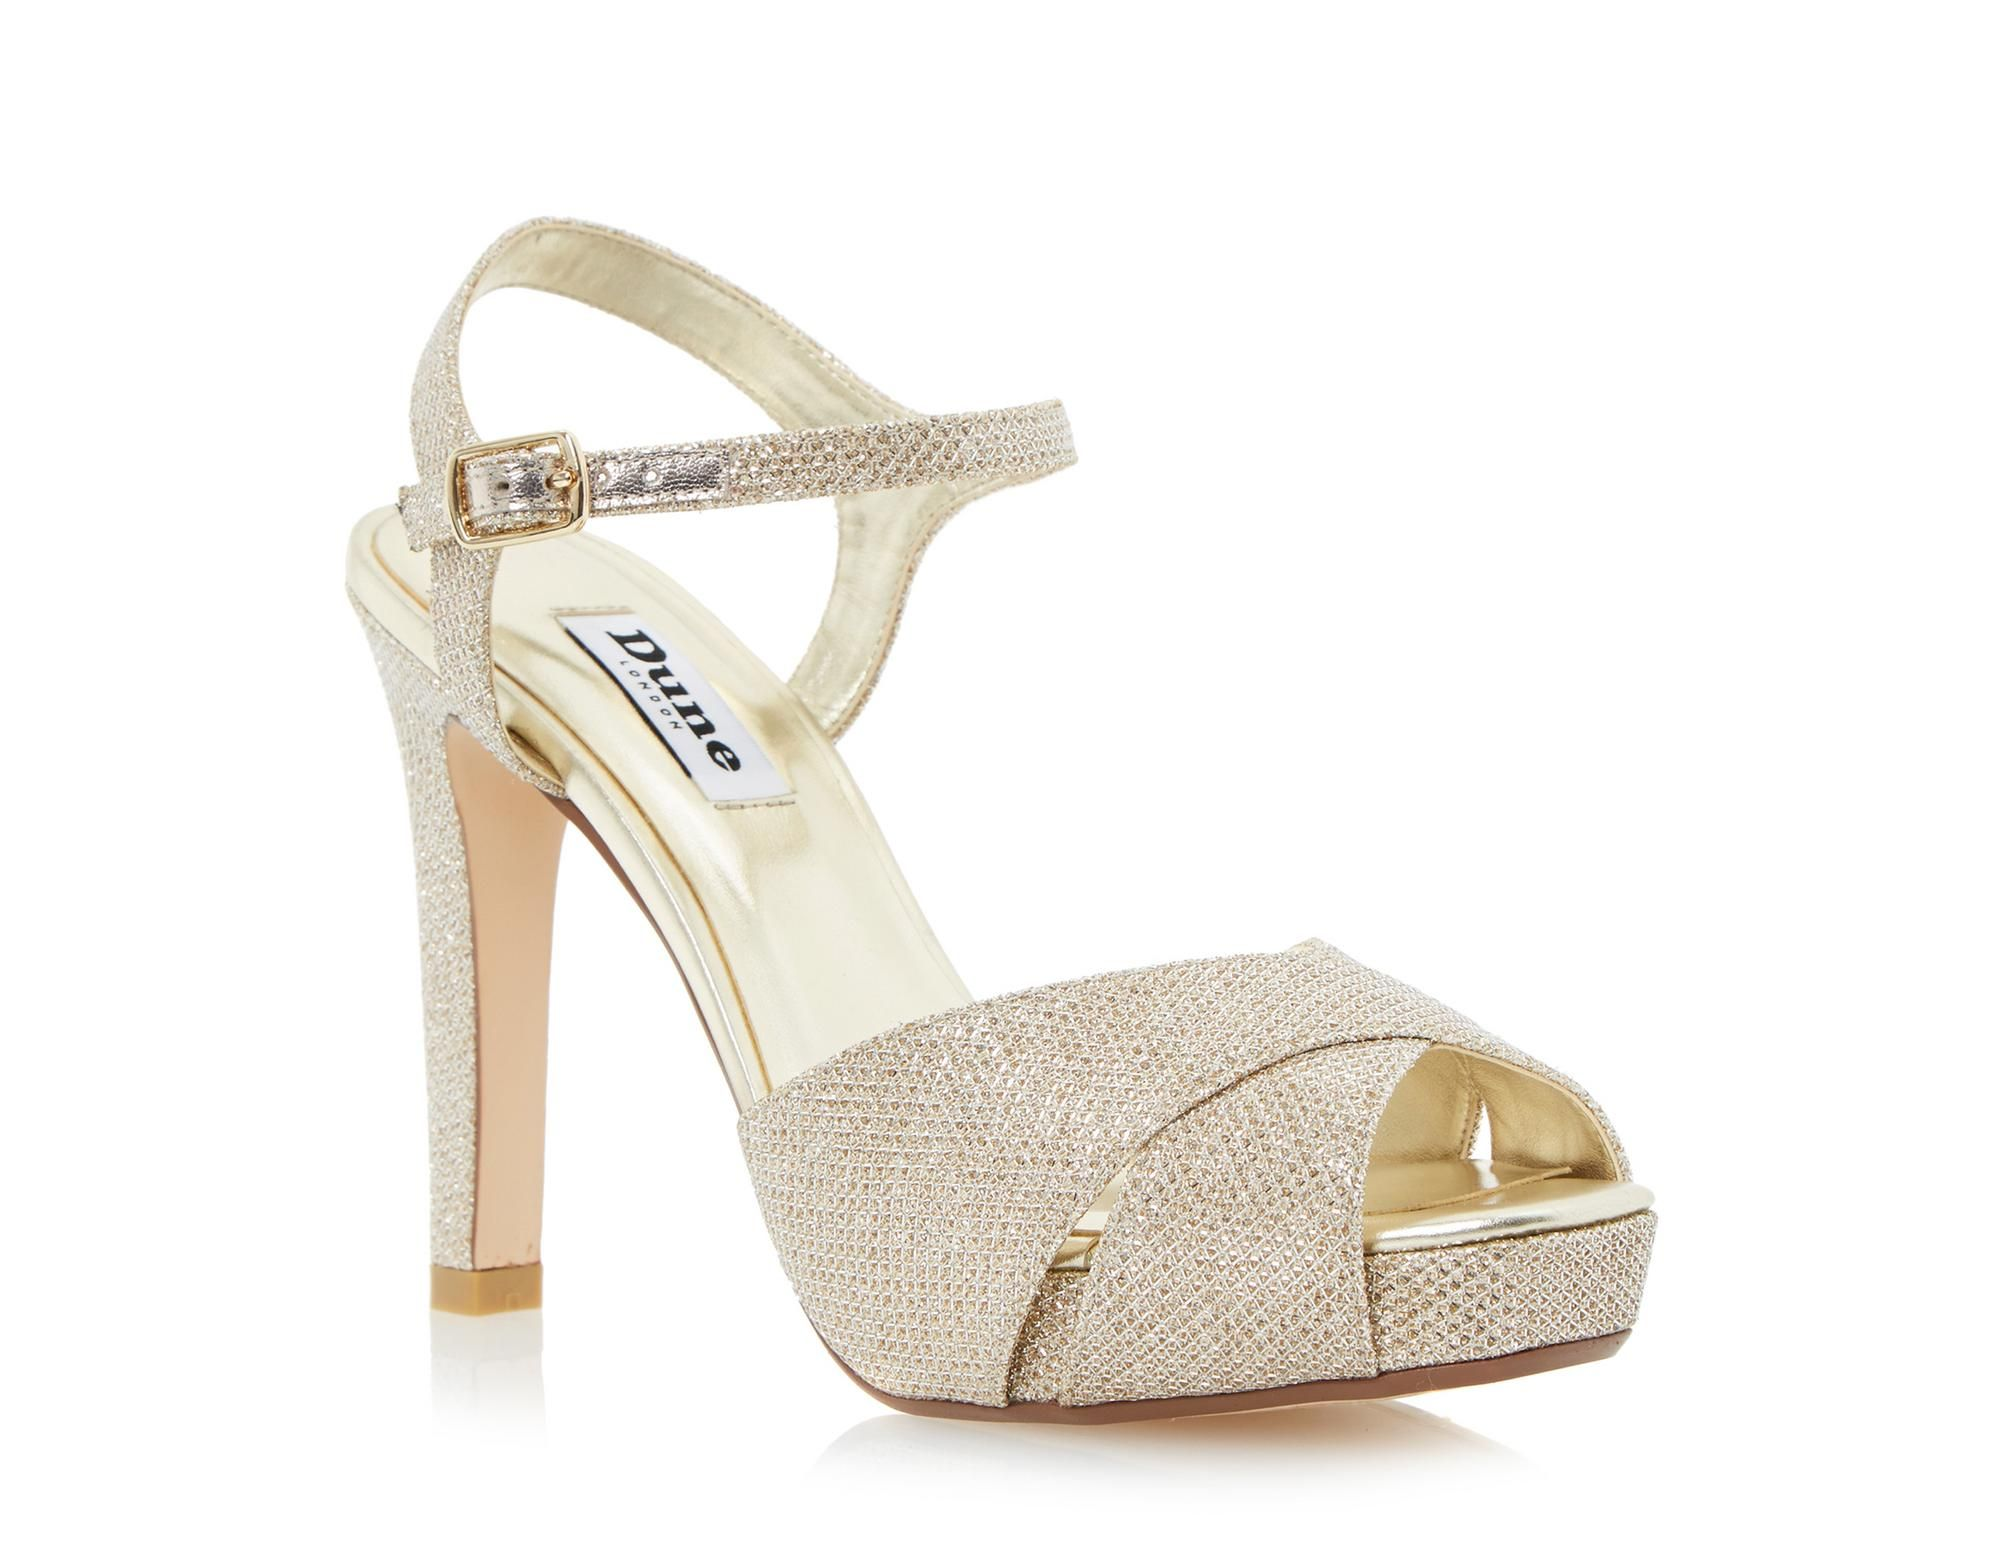 df812745e1d7 DUNE LADIES MARLEEN - Crossover Strap High Heel Sandal - gold